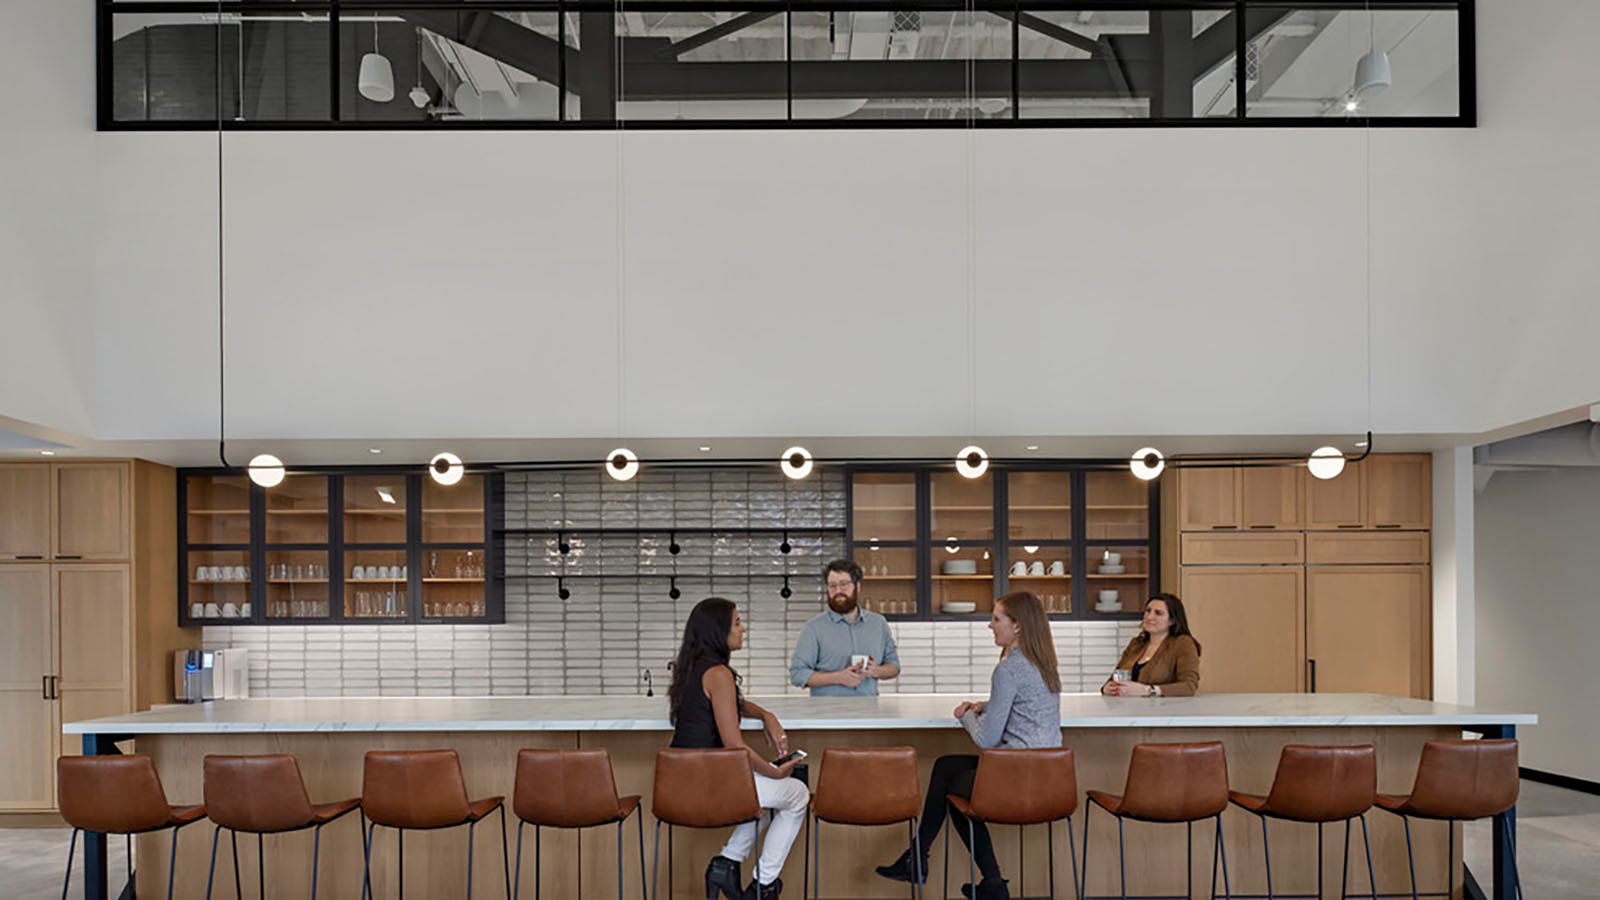 Silversmith employee-only kitchen area